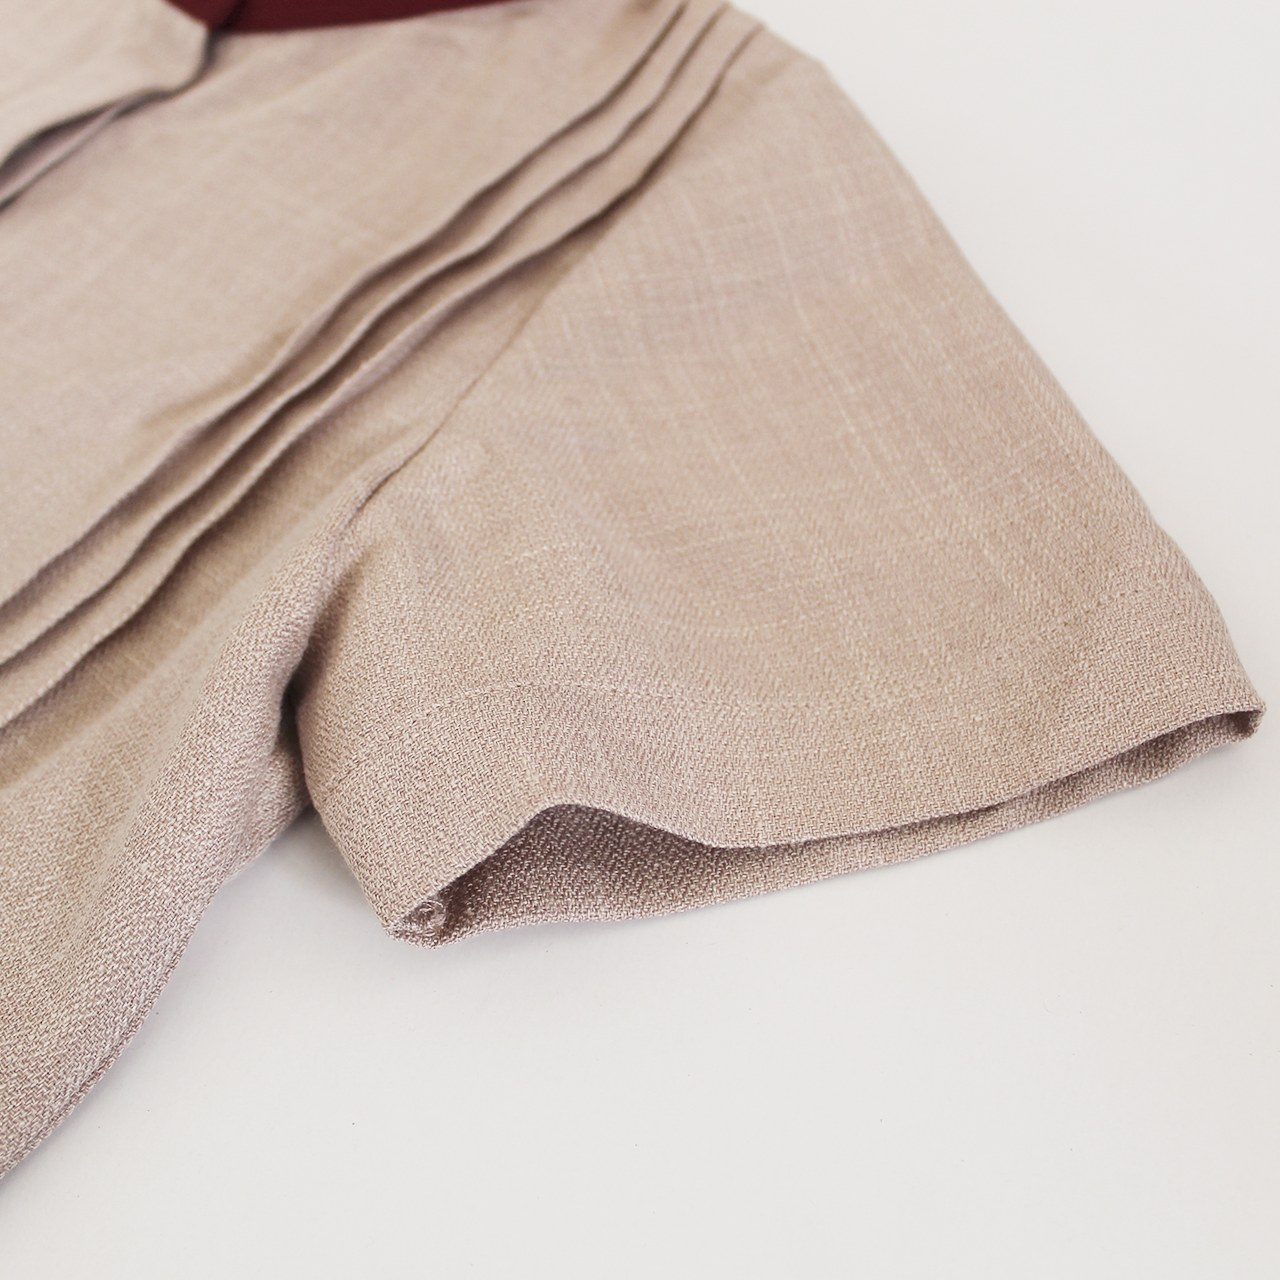 Design Baju Lebaran Dewasa Xtd6 Sarimbit Baju Lebaran Anak Dewasa Iac Baju Koko orlin Ayah